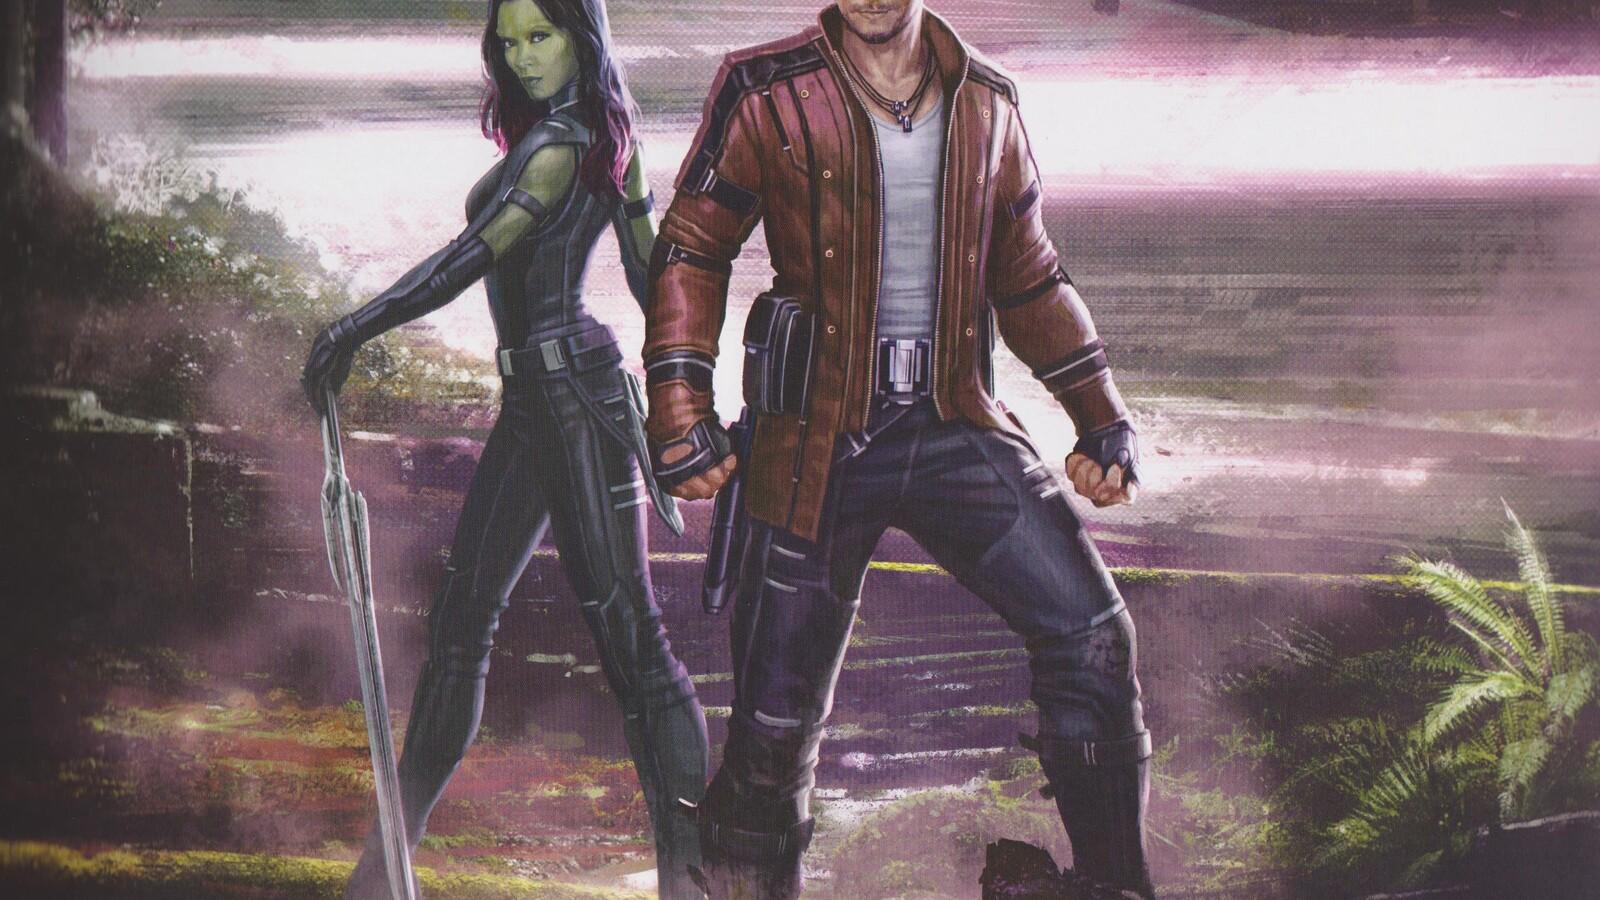 star-lord-and-gamora-artwork-oh.jpg